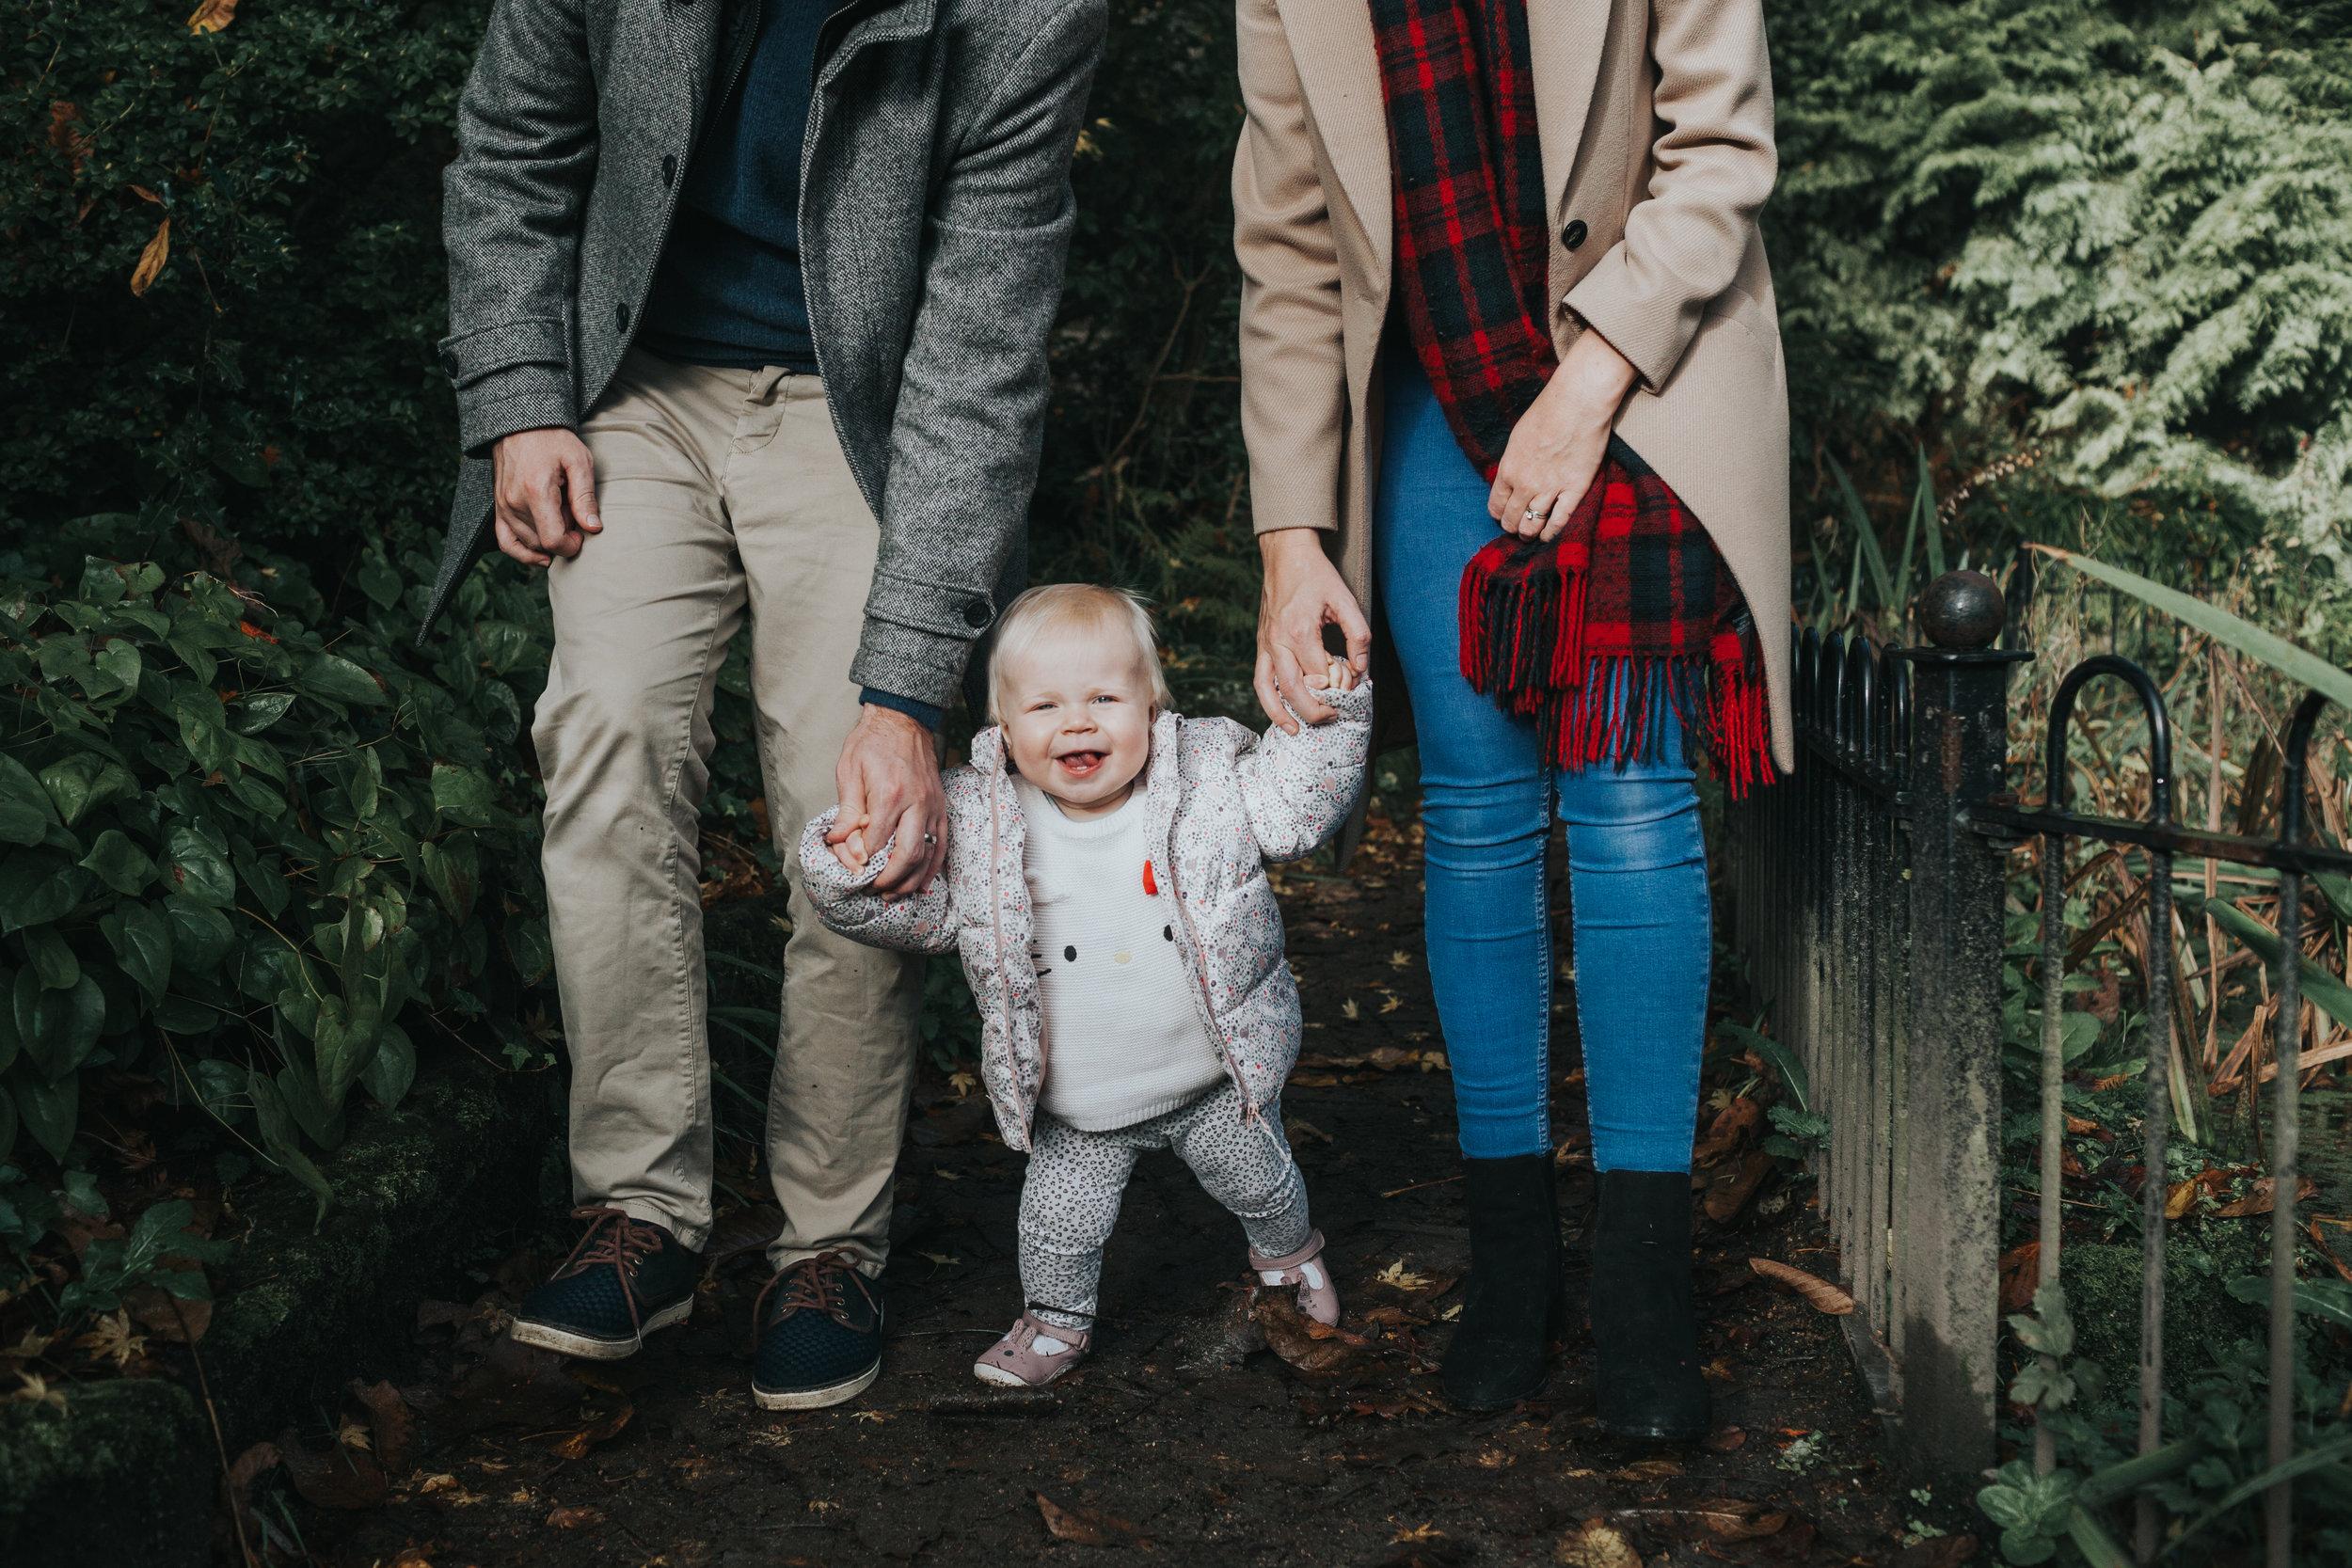 Evie is walking between her Mum and Dad's legs.